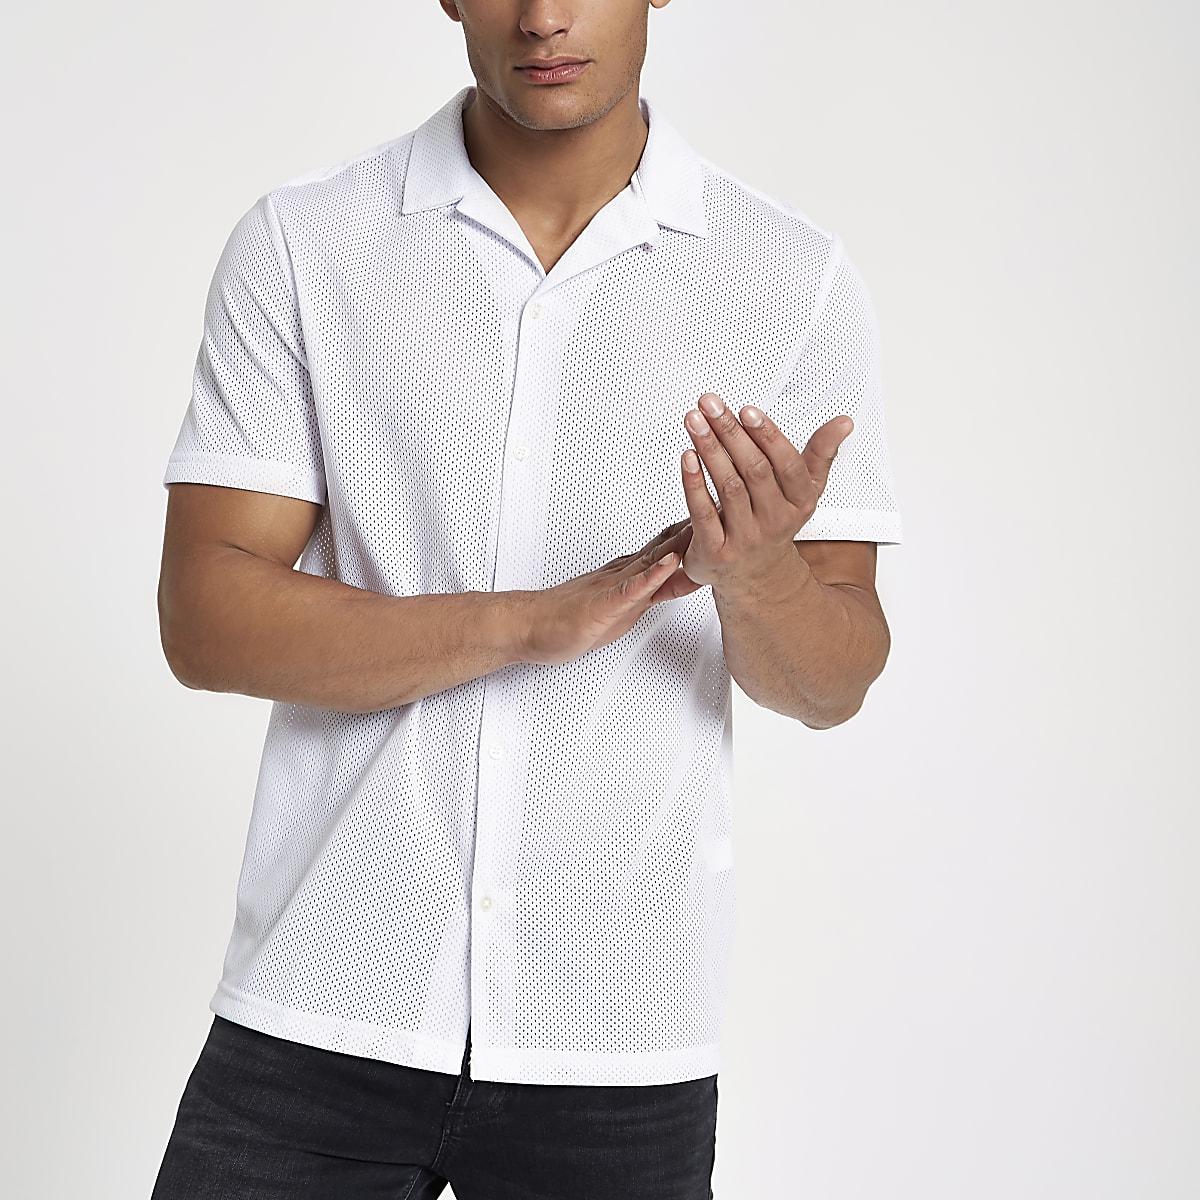 9f3a10c18b4bd White mesh revere collar shirt - Short Sleeve Shirts - Shirts - men